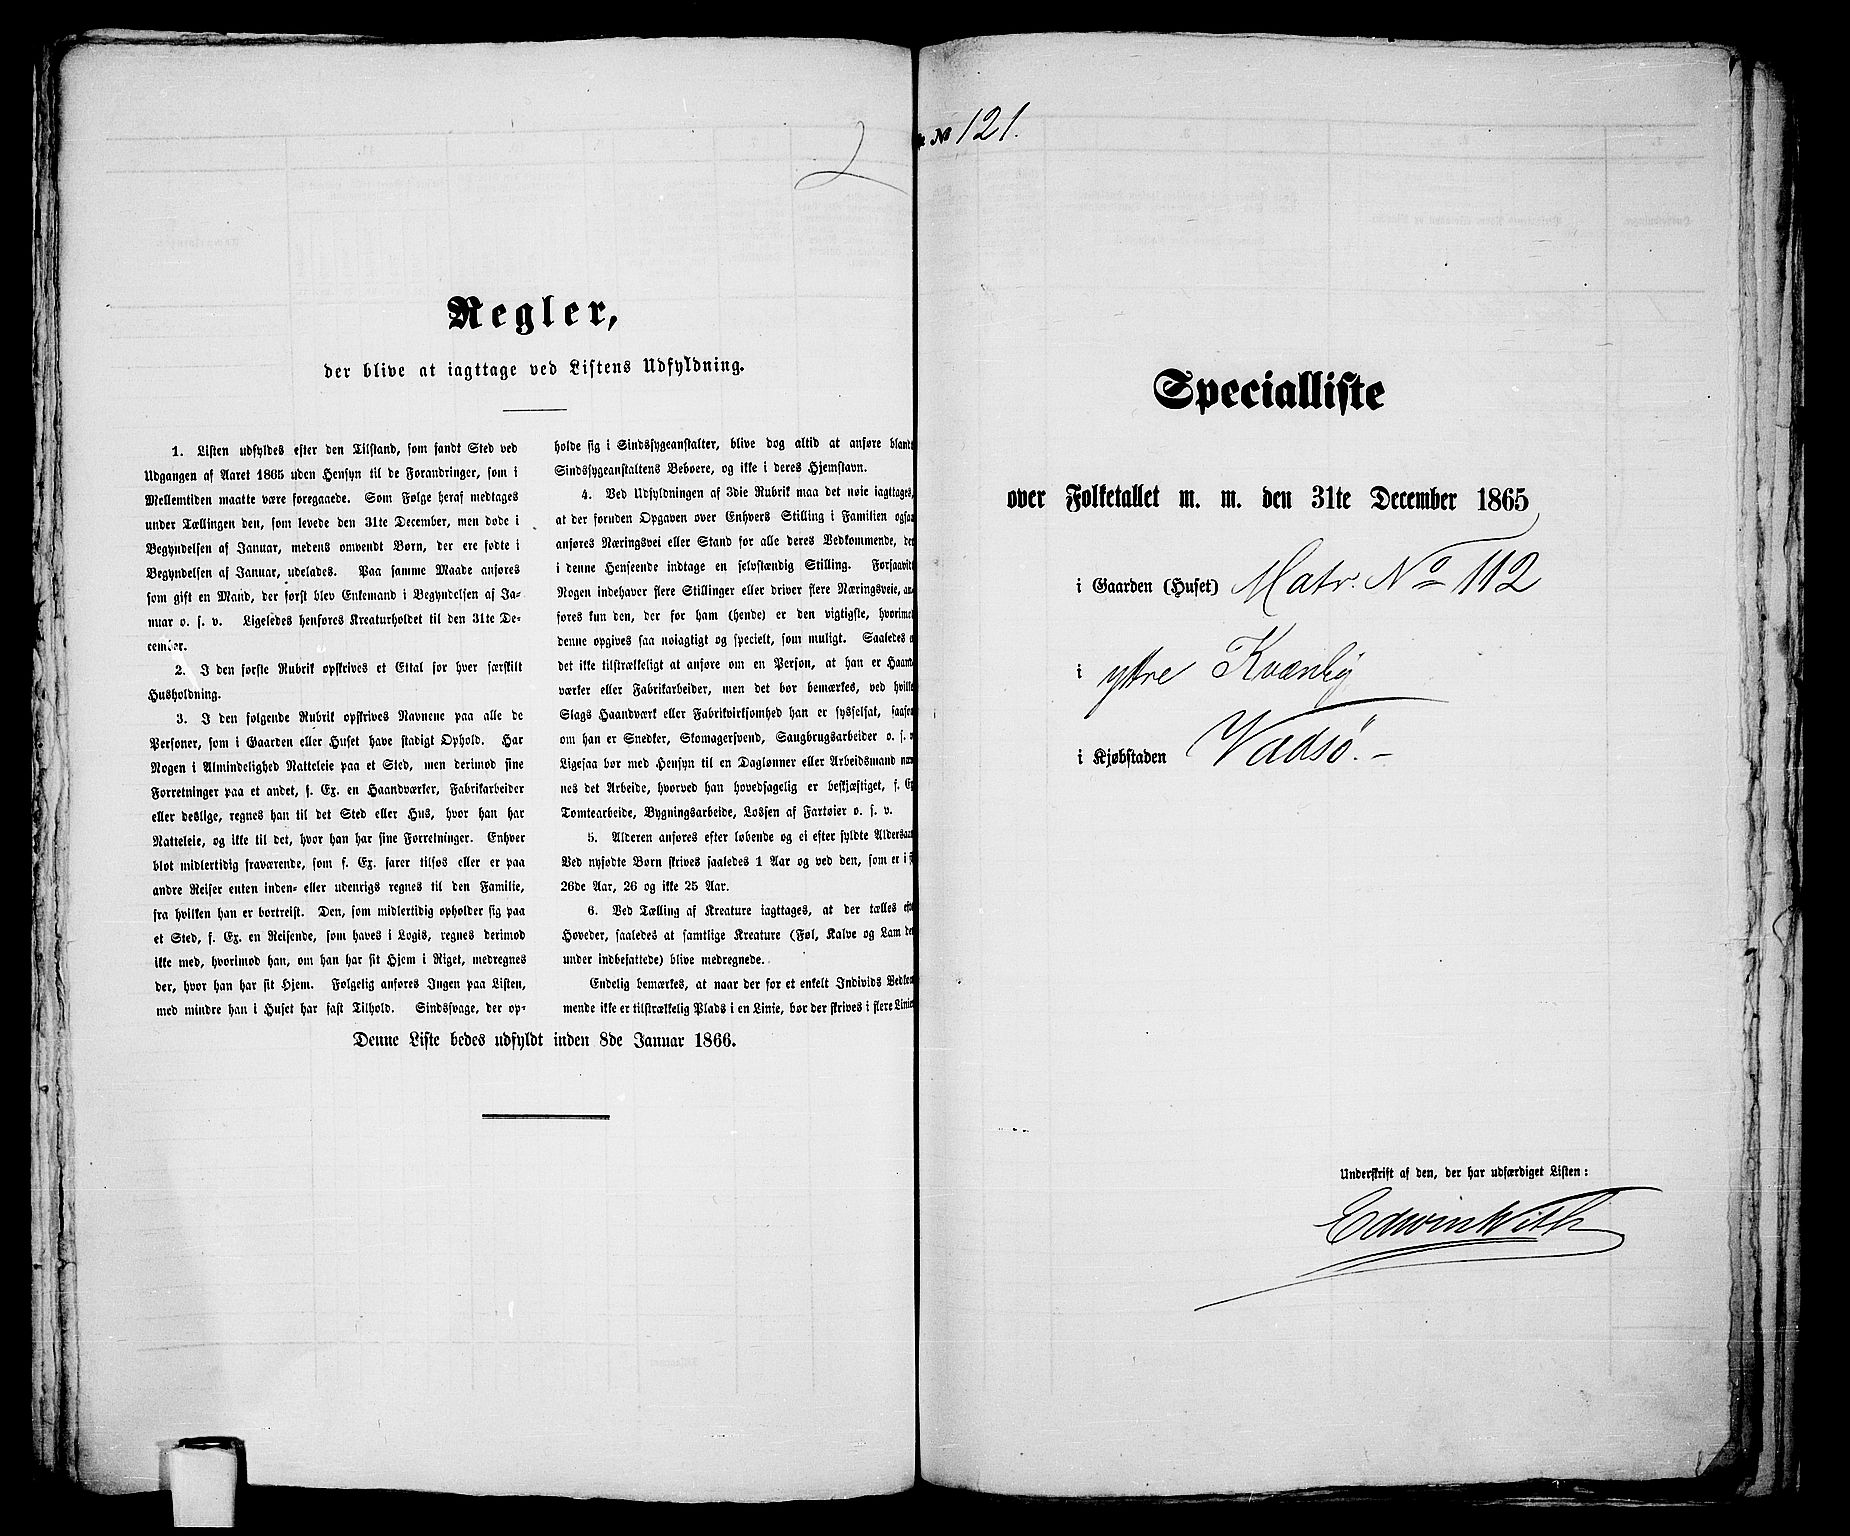 RA, 1865 census for Vadsø/Vadsø, 1865, p. 248